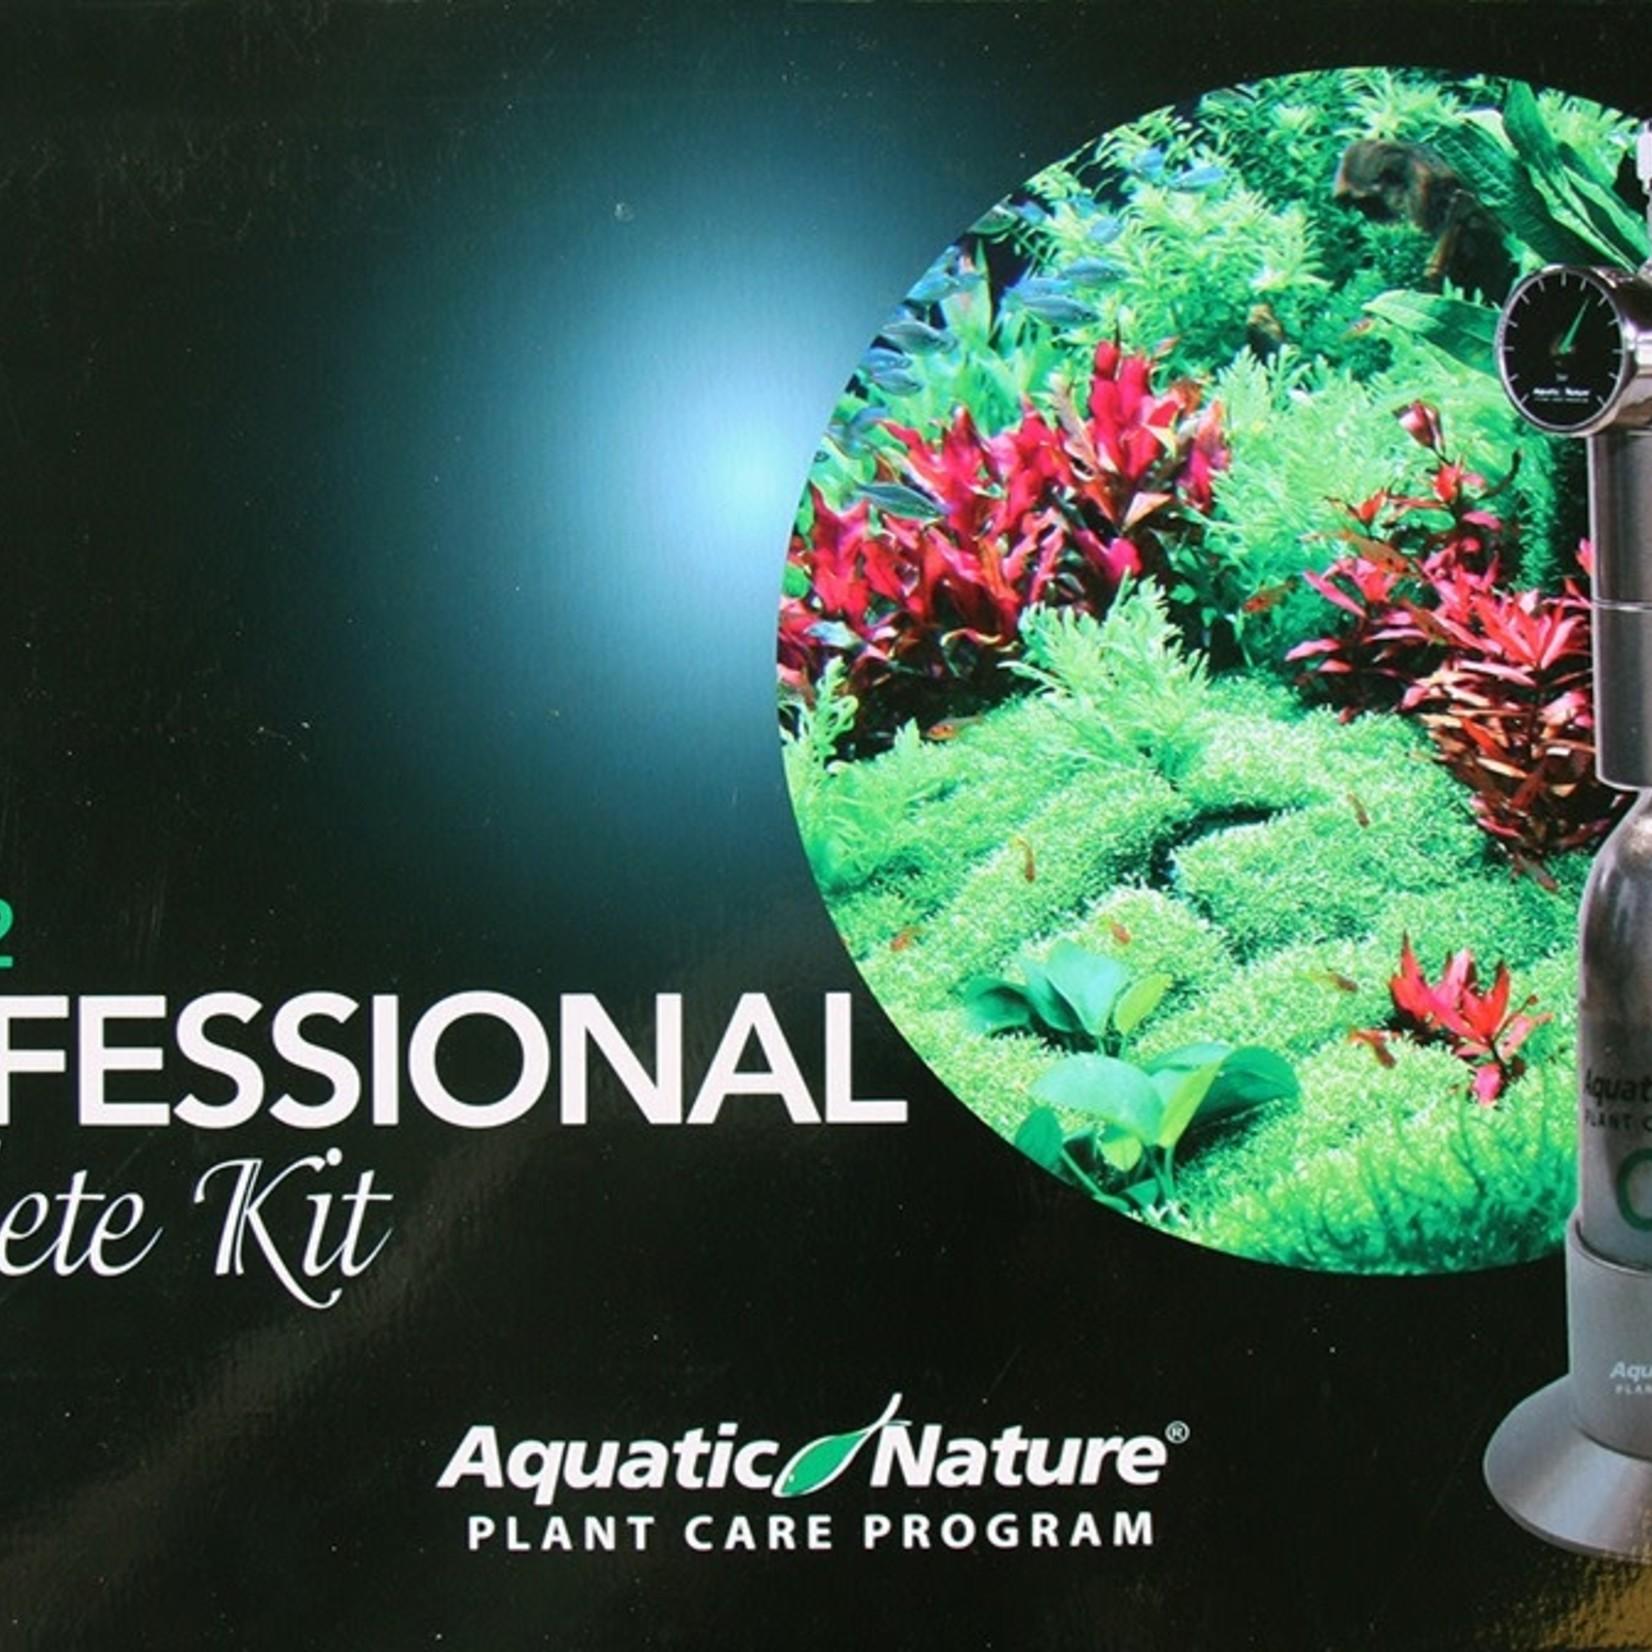 Aquatic Nature CO2 PROFESSIONELE KIT Blau